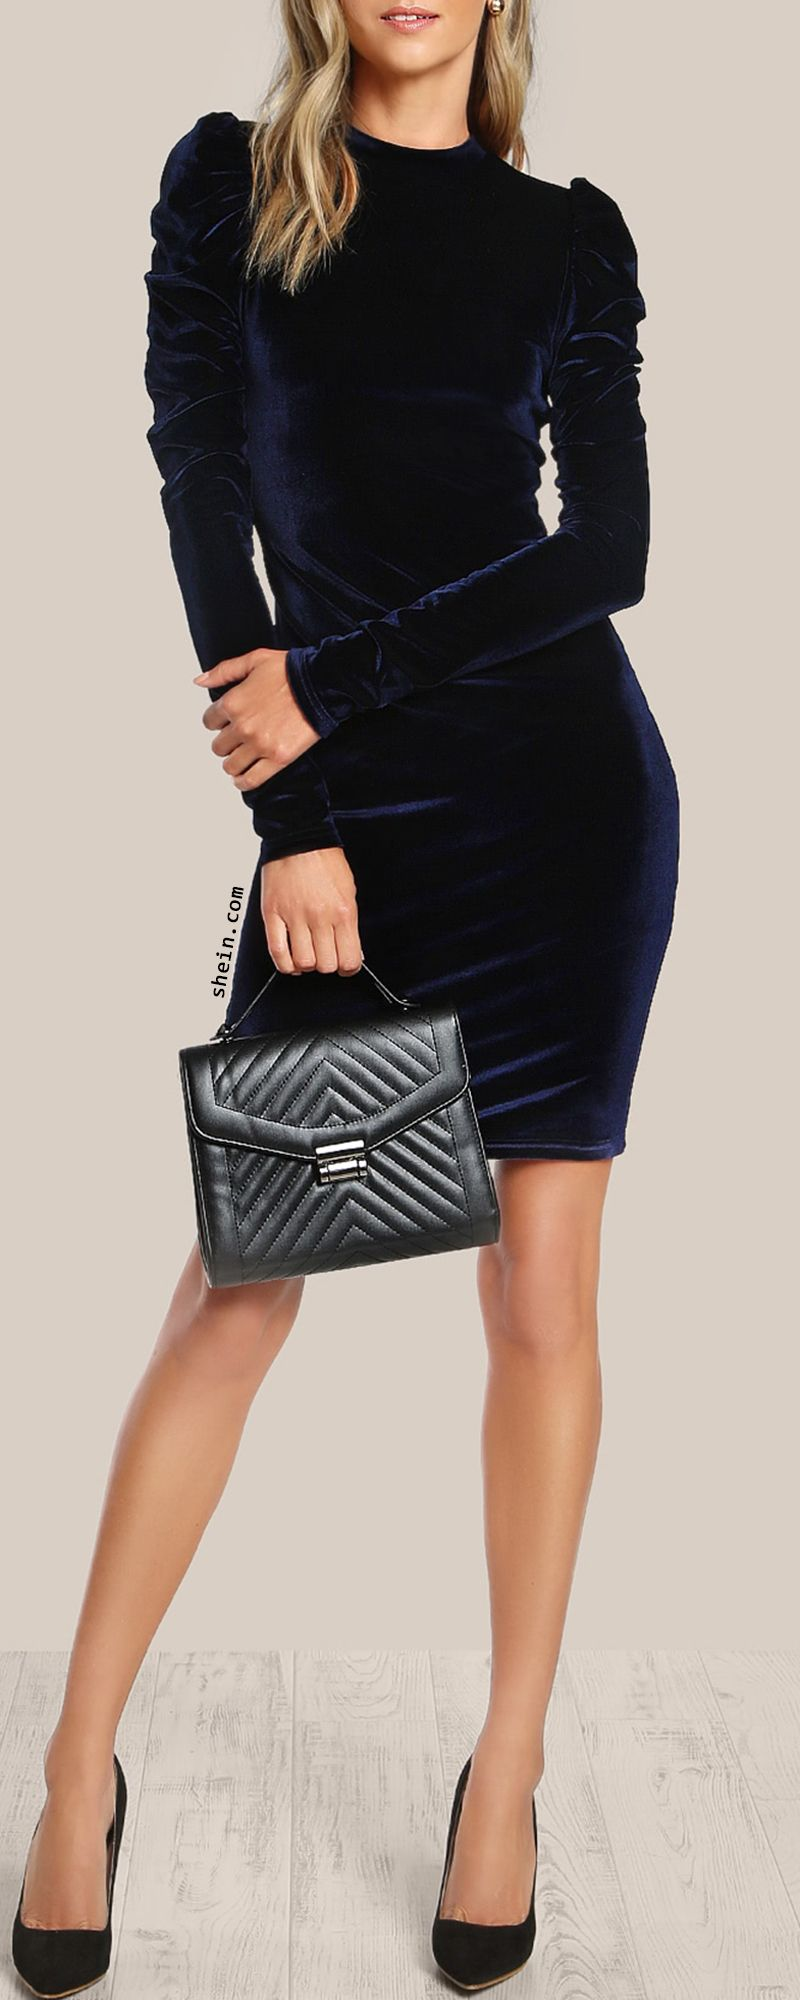 752e5a4b92e SHEIN Puff Sleeve Velvet Pencil Dress